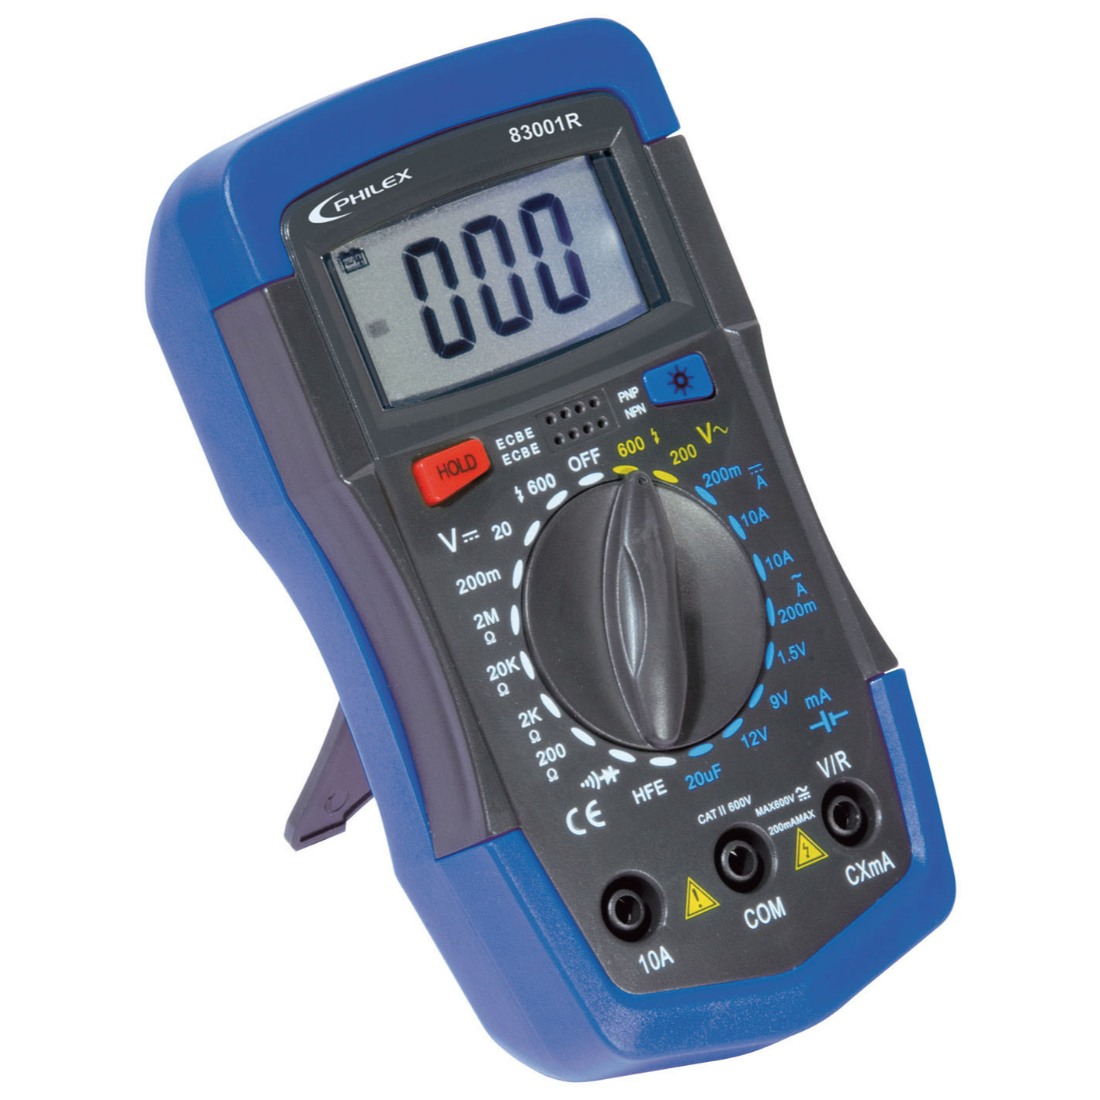 Cat Iii Multimeter : Philex cat iii a v digital multimeter w battery test